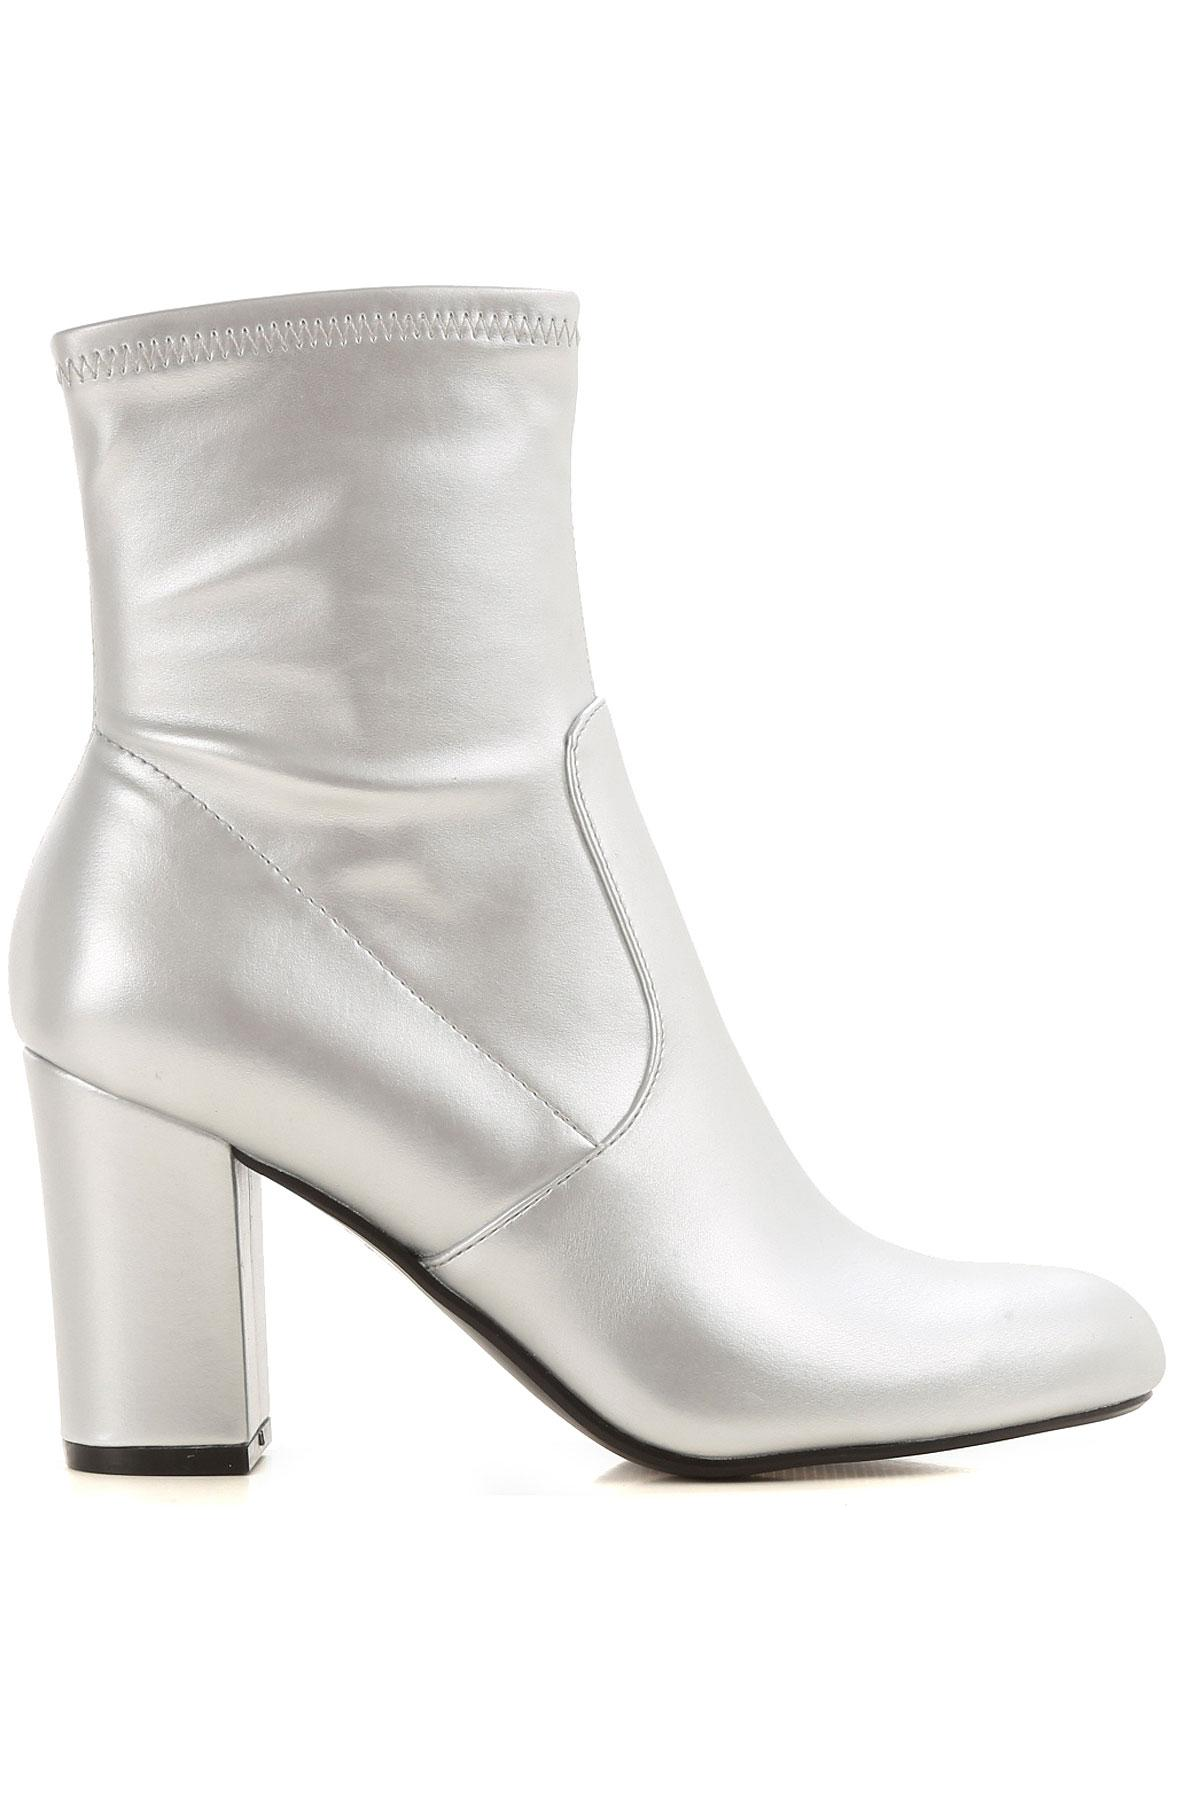 aa6e72510d7 Steve Madden - Multicolor Shoes For Women - Lyst. View fullscreen